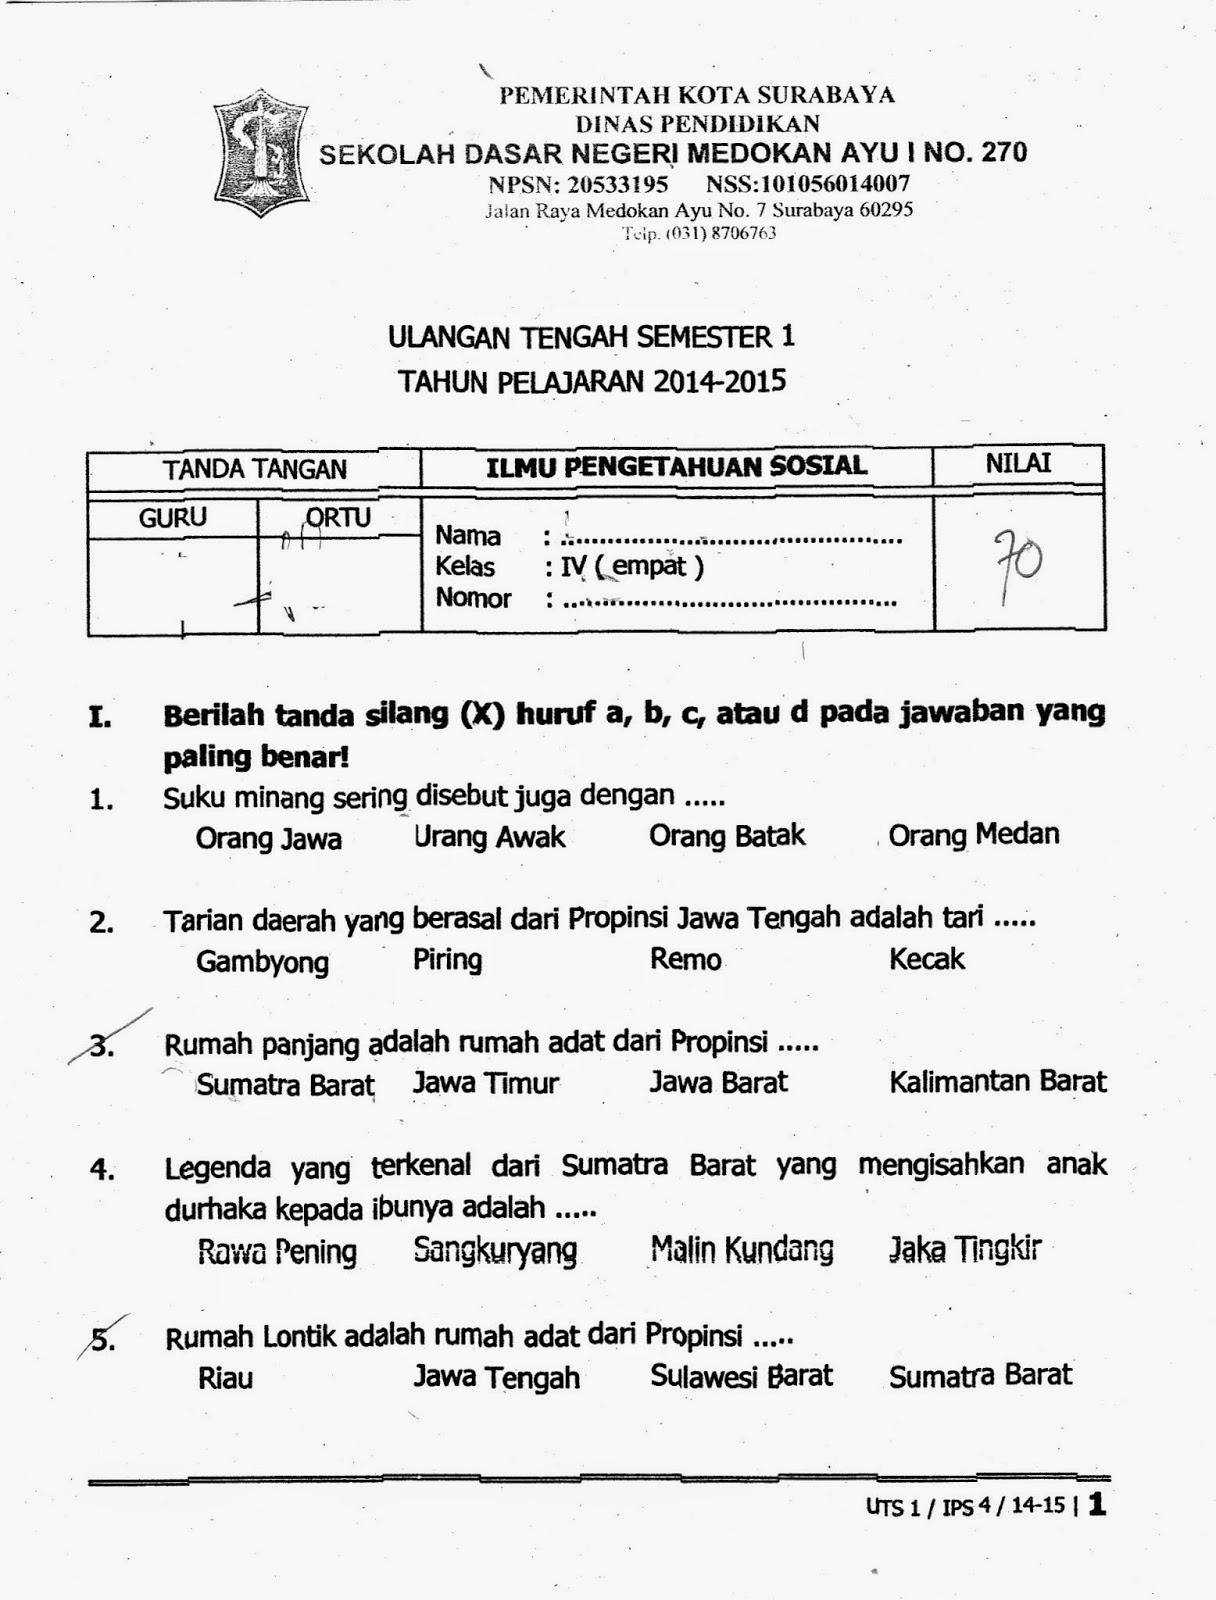 IPS Soal PKN SD kelas 4 Kurikulum 2013